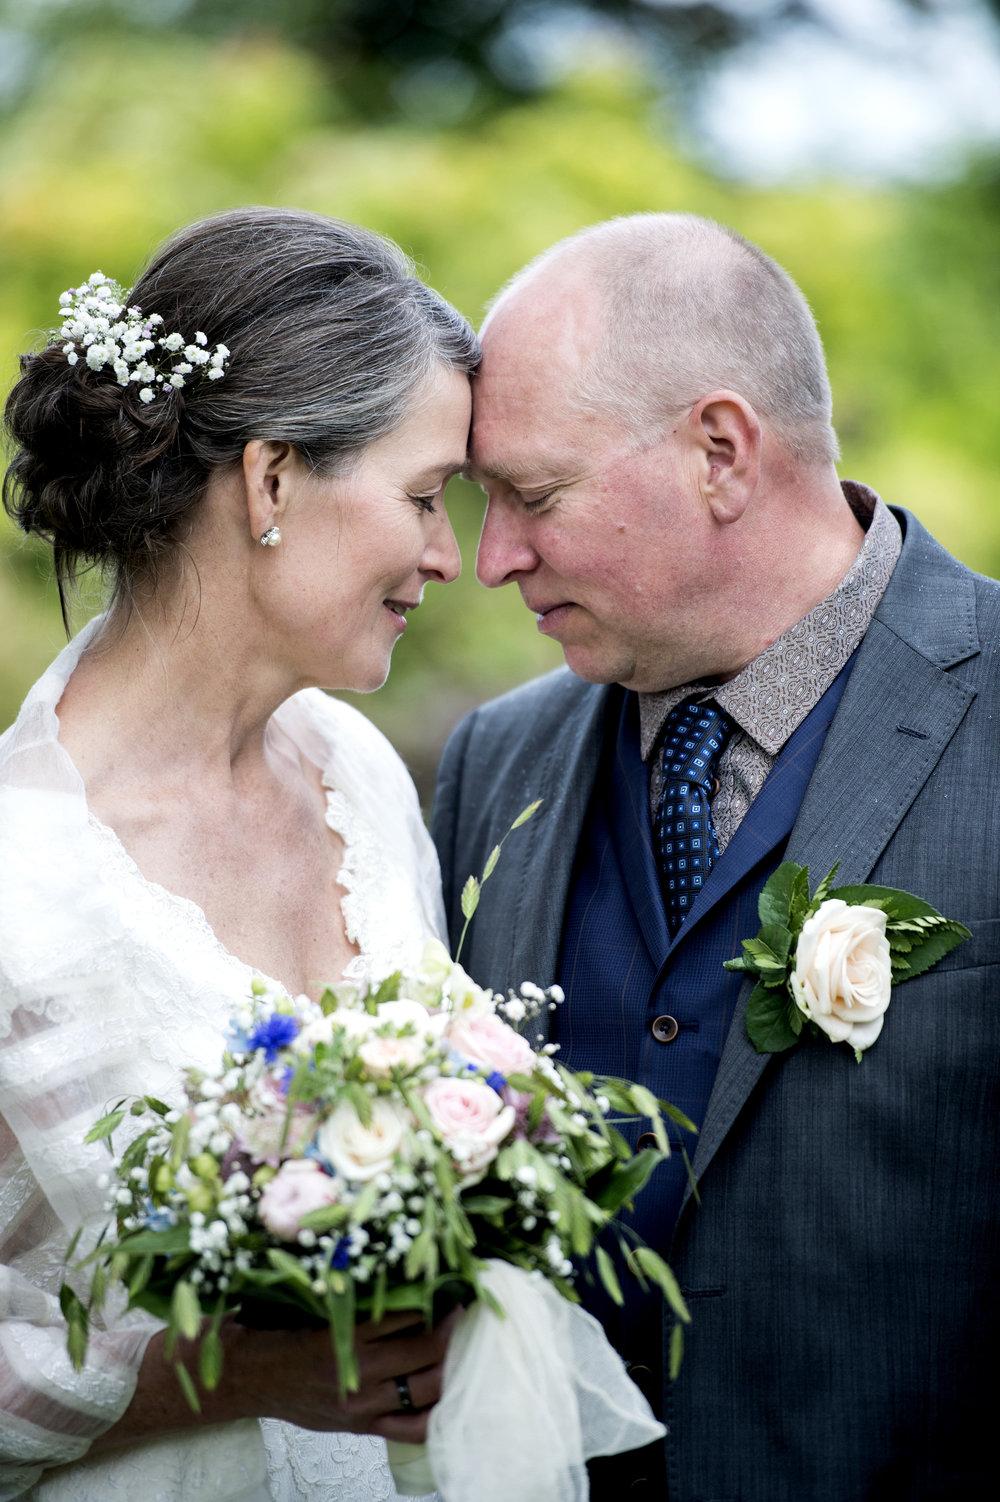 Lisbeth og Hans - Bryllup - Farve 87.jpg